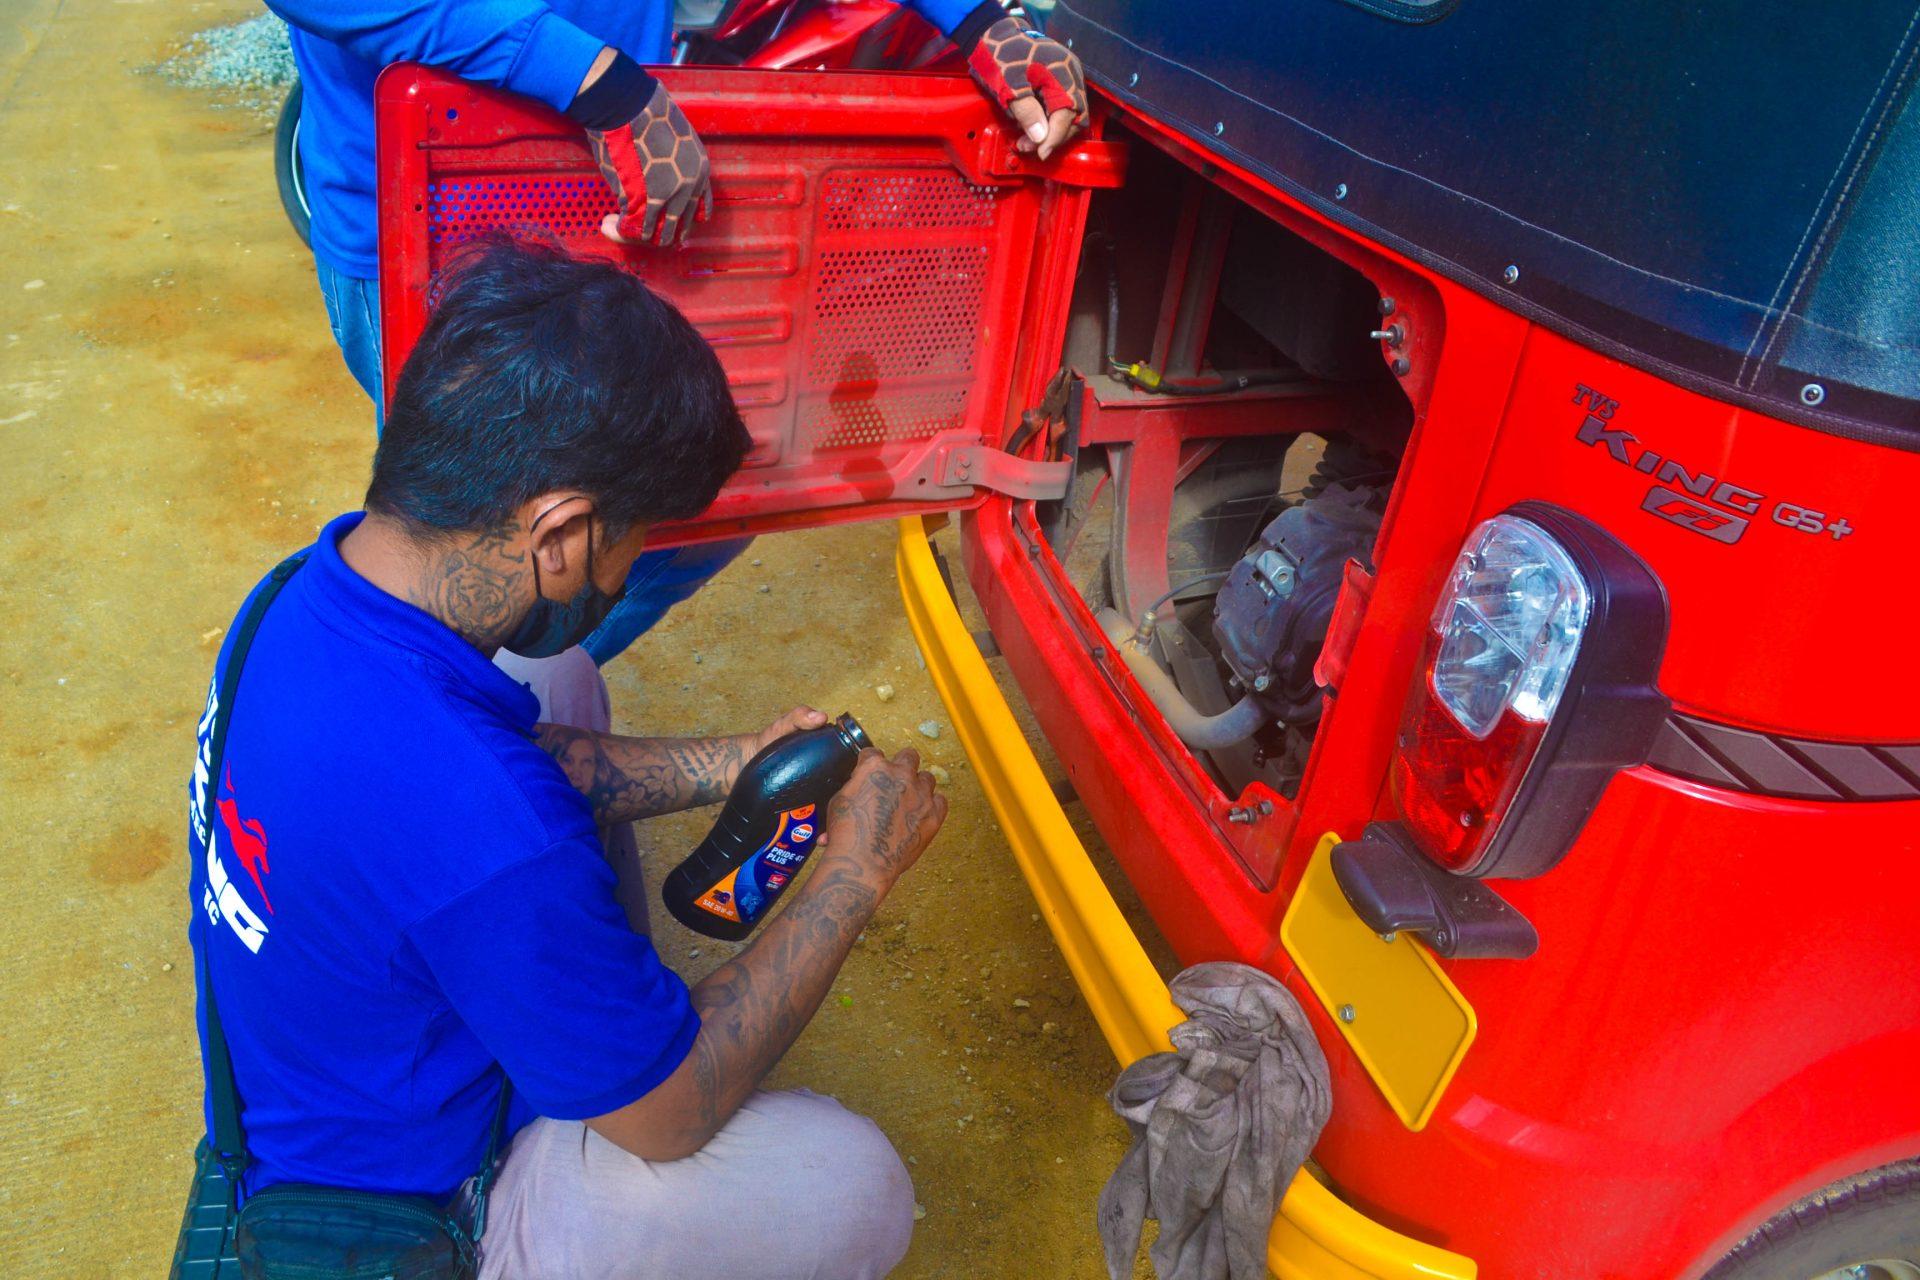 Ken preparing to do an oil change